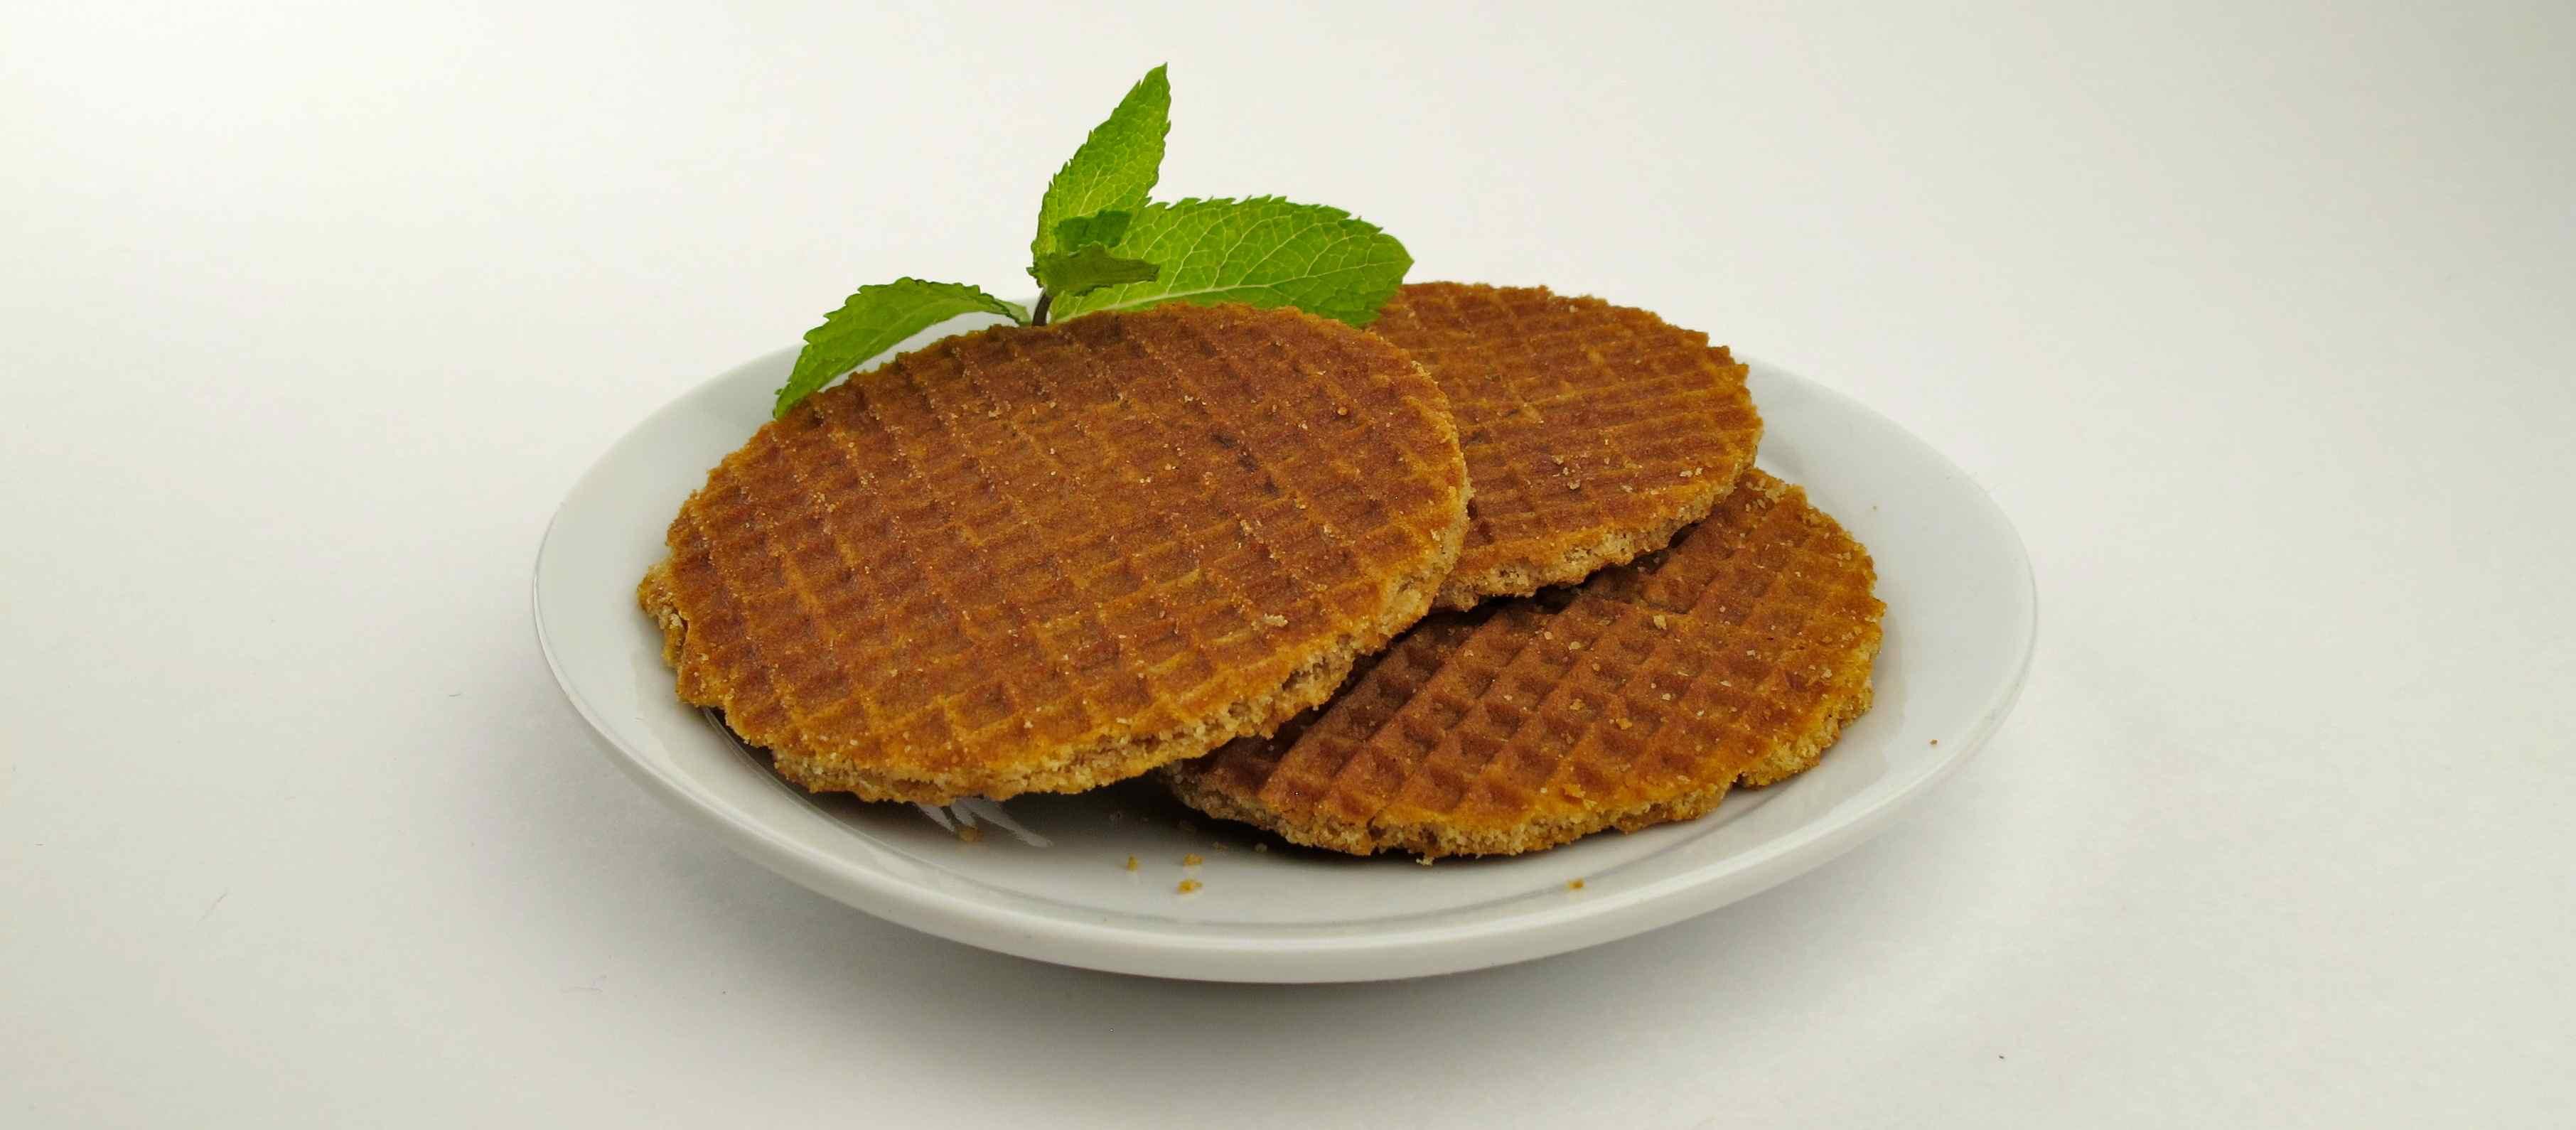 Waffles vegan inside